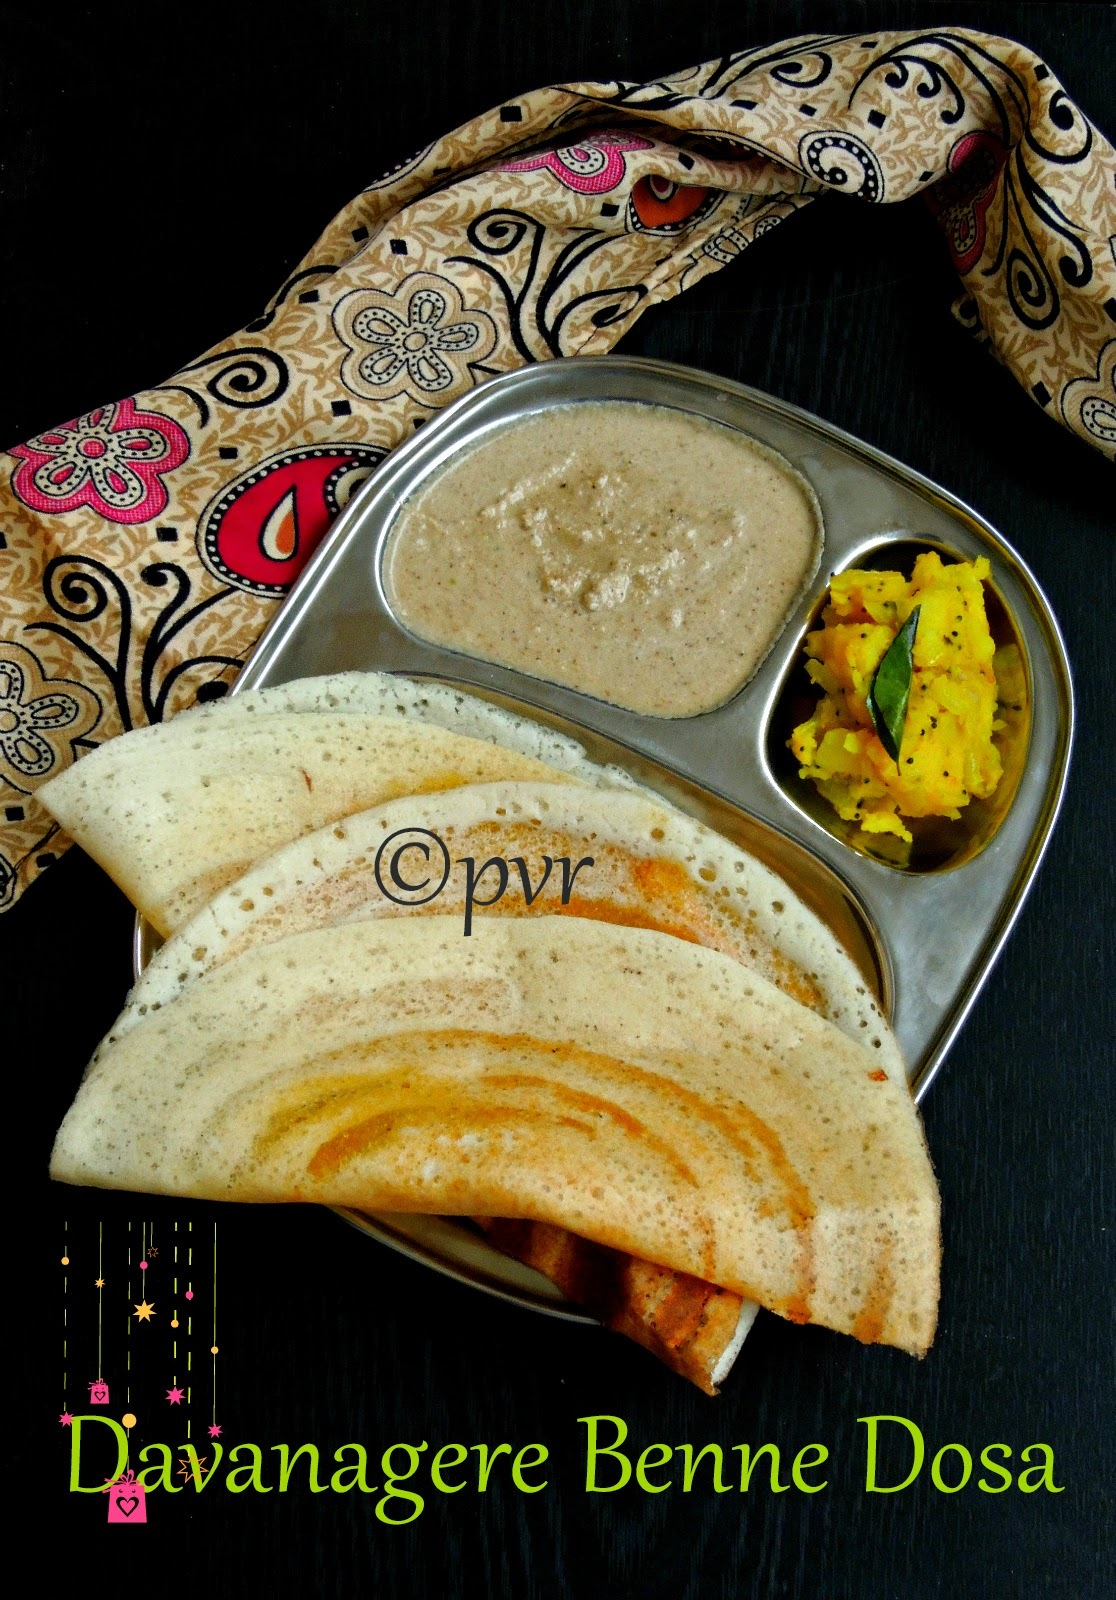 Davanagere Benne Dosa - Karnataka Special